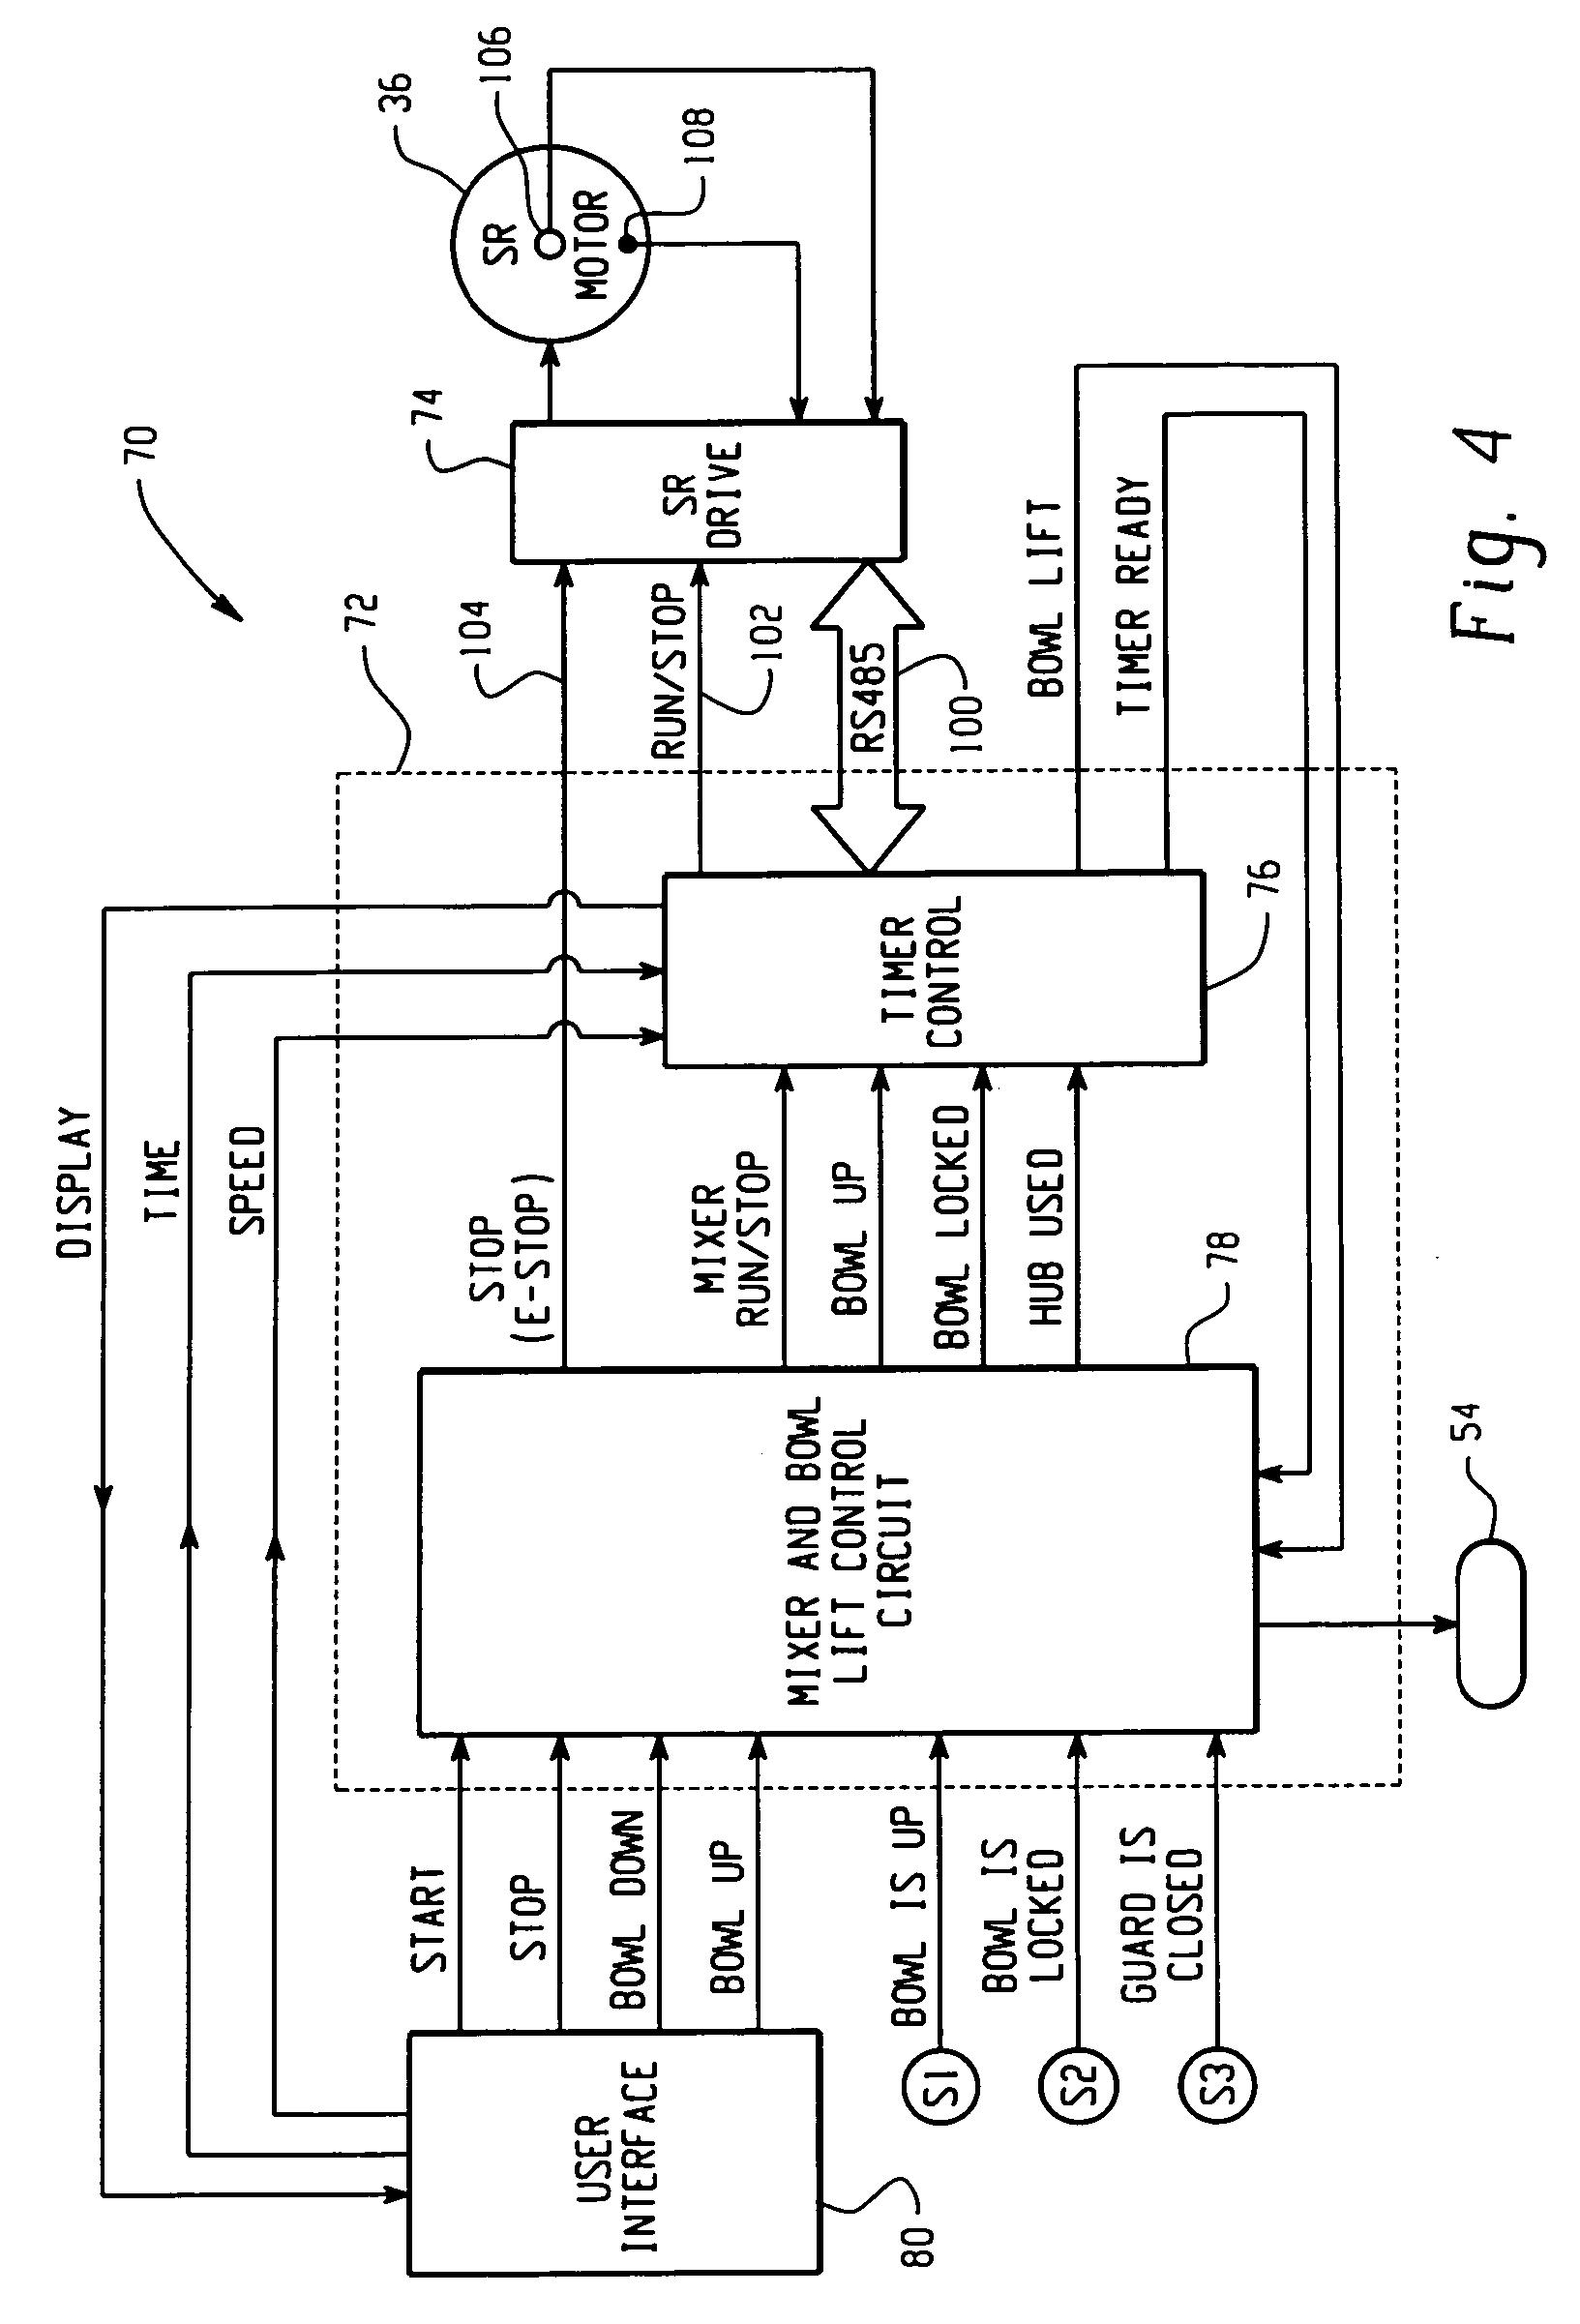 Hobart D300 Mixer Wiring Diagram